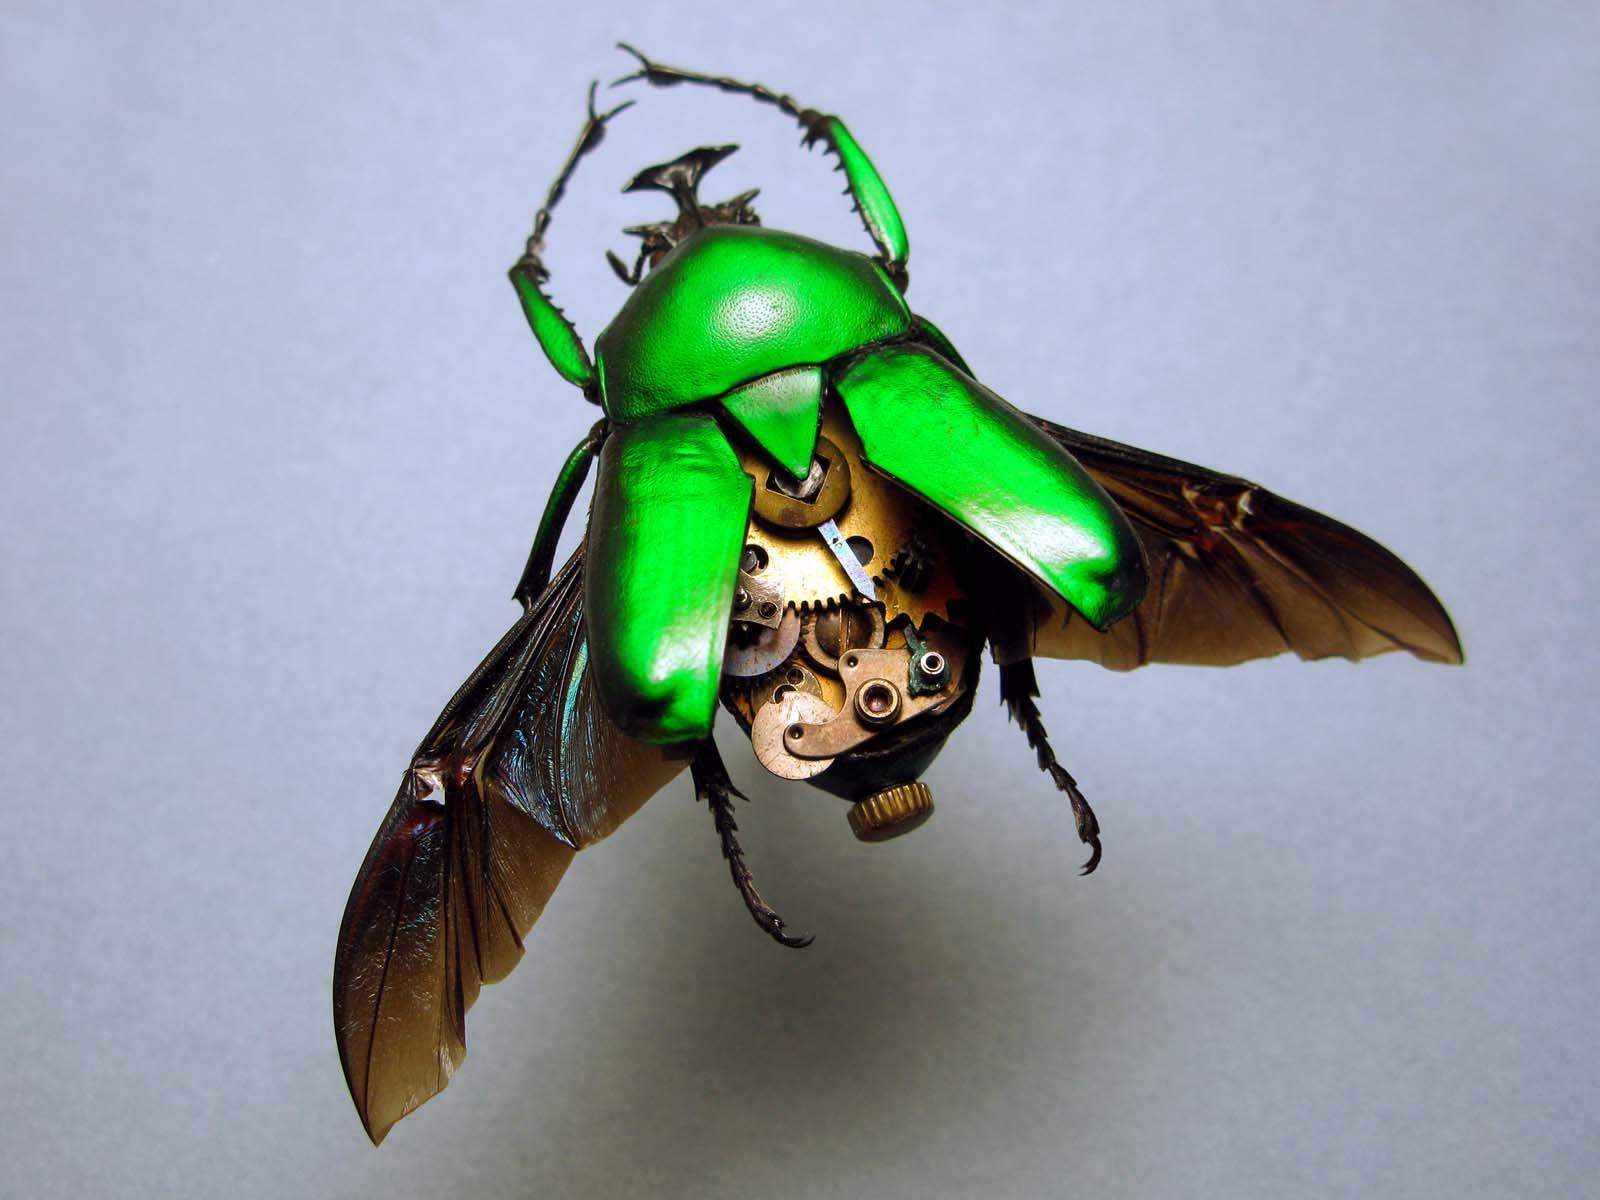 Cetonidae: Dicronorhina Micans